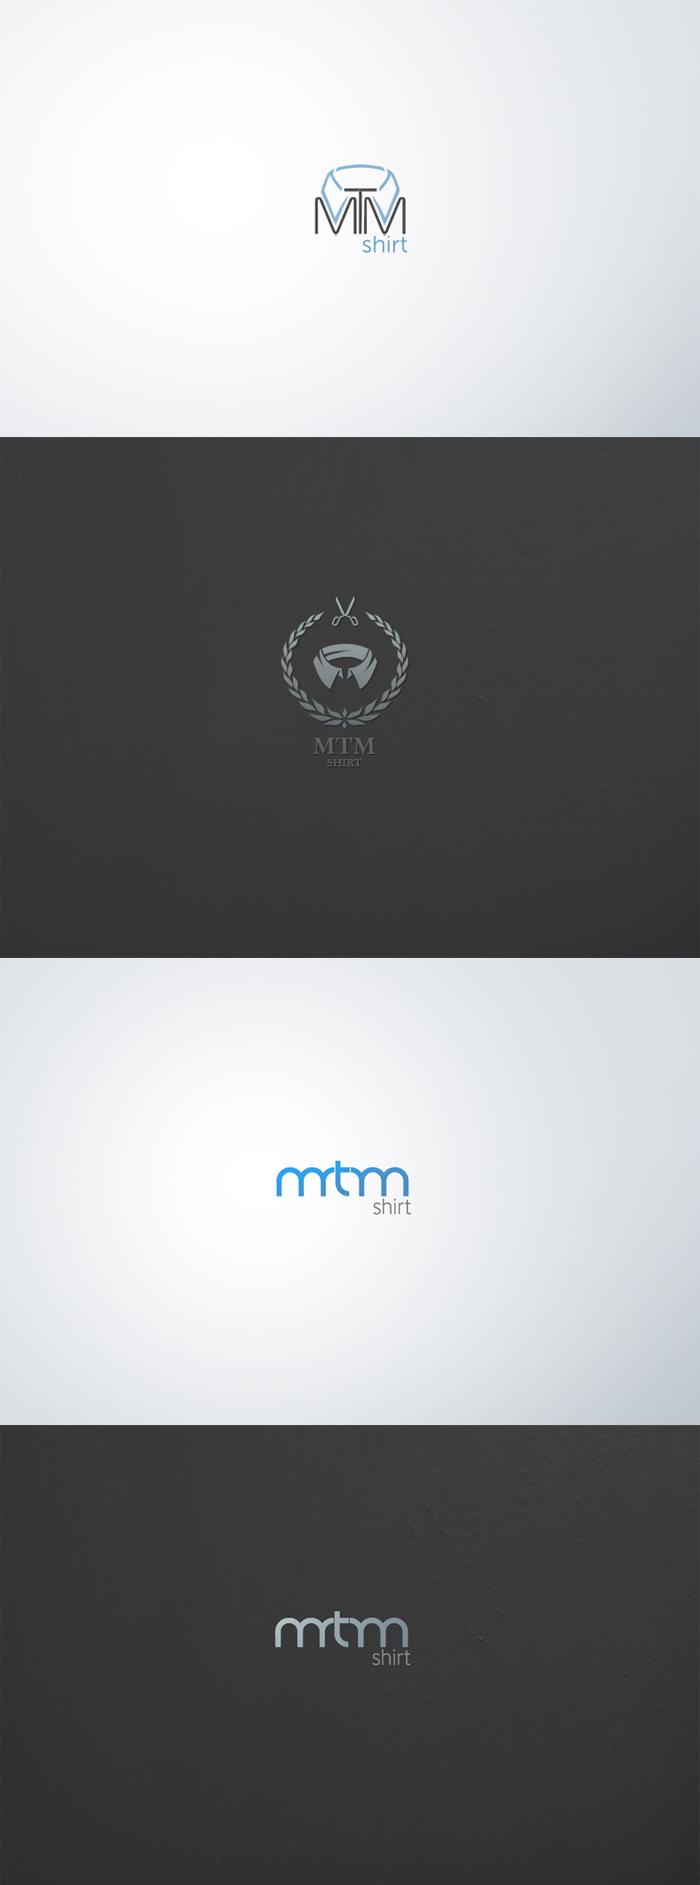 MTM shirt logo